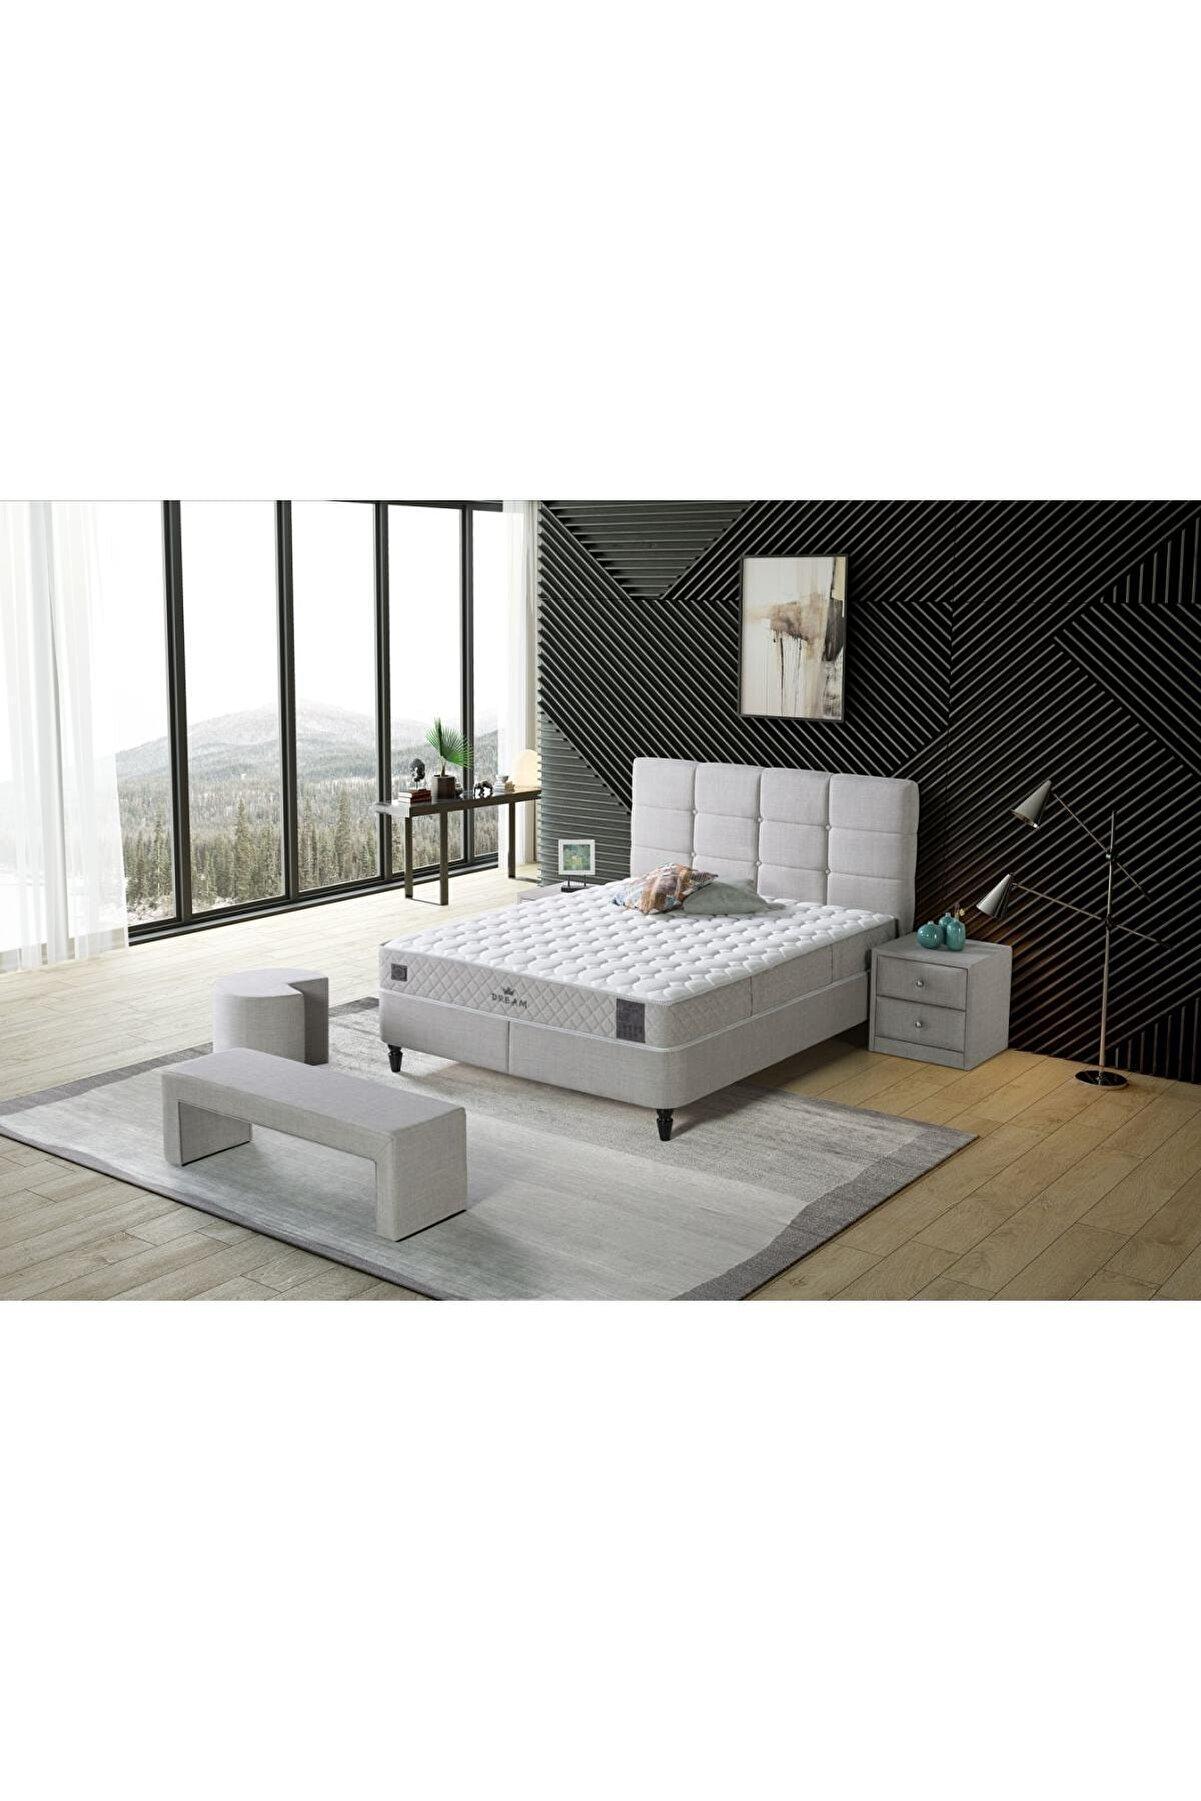 ABC Dream Standart Set 160x200